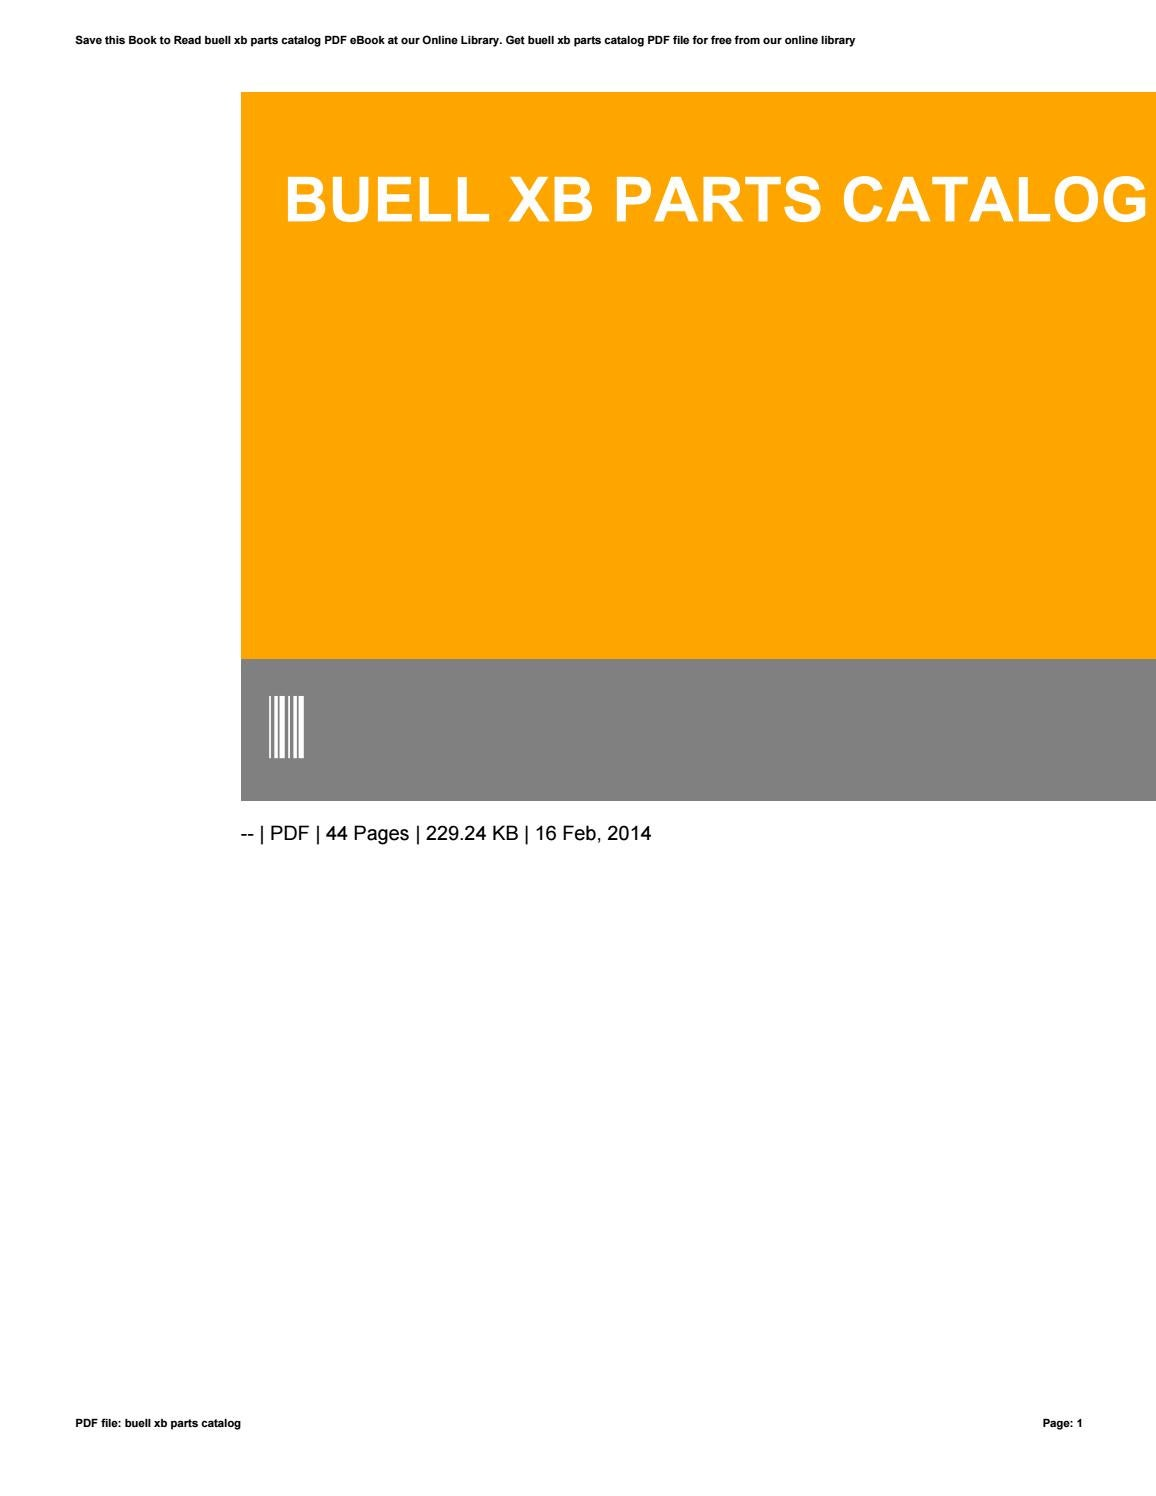 Buell xb parts catalog by sabrina78aura - issuu